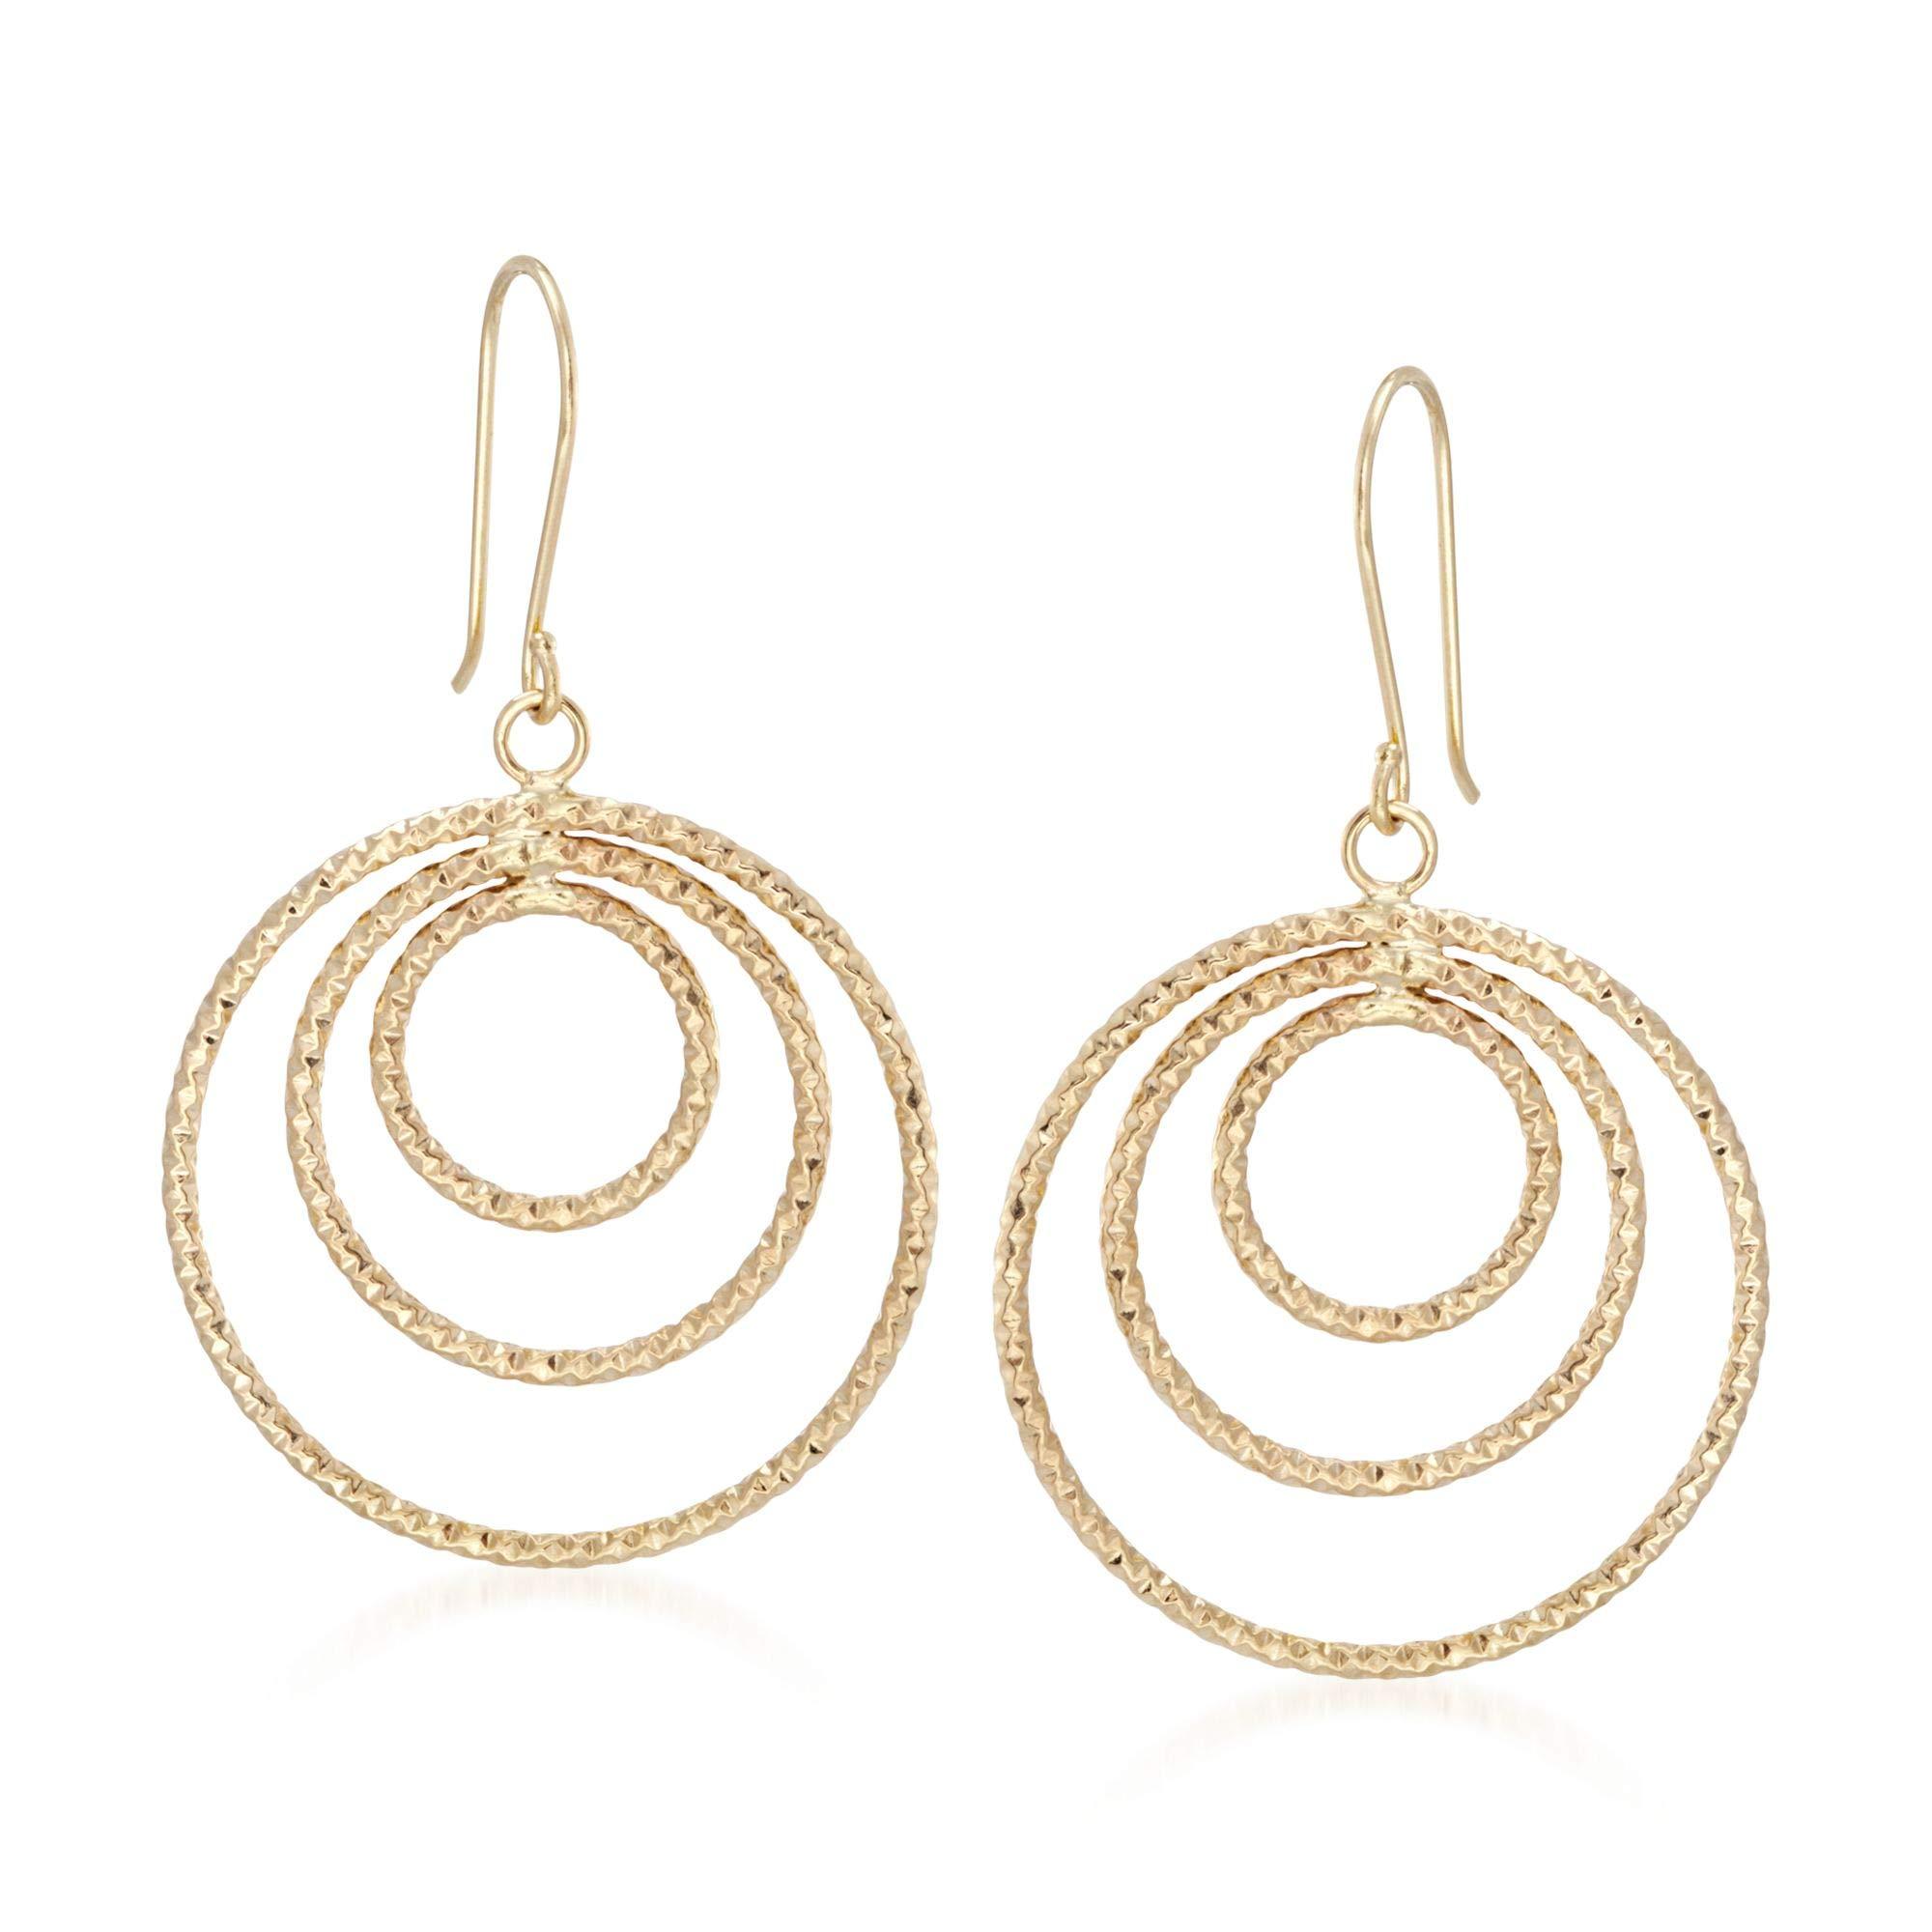 Ross-Simons 14kt Yellow Gold Triple Circle Drop Earrings